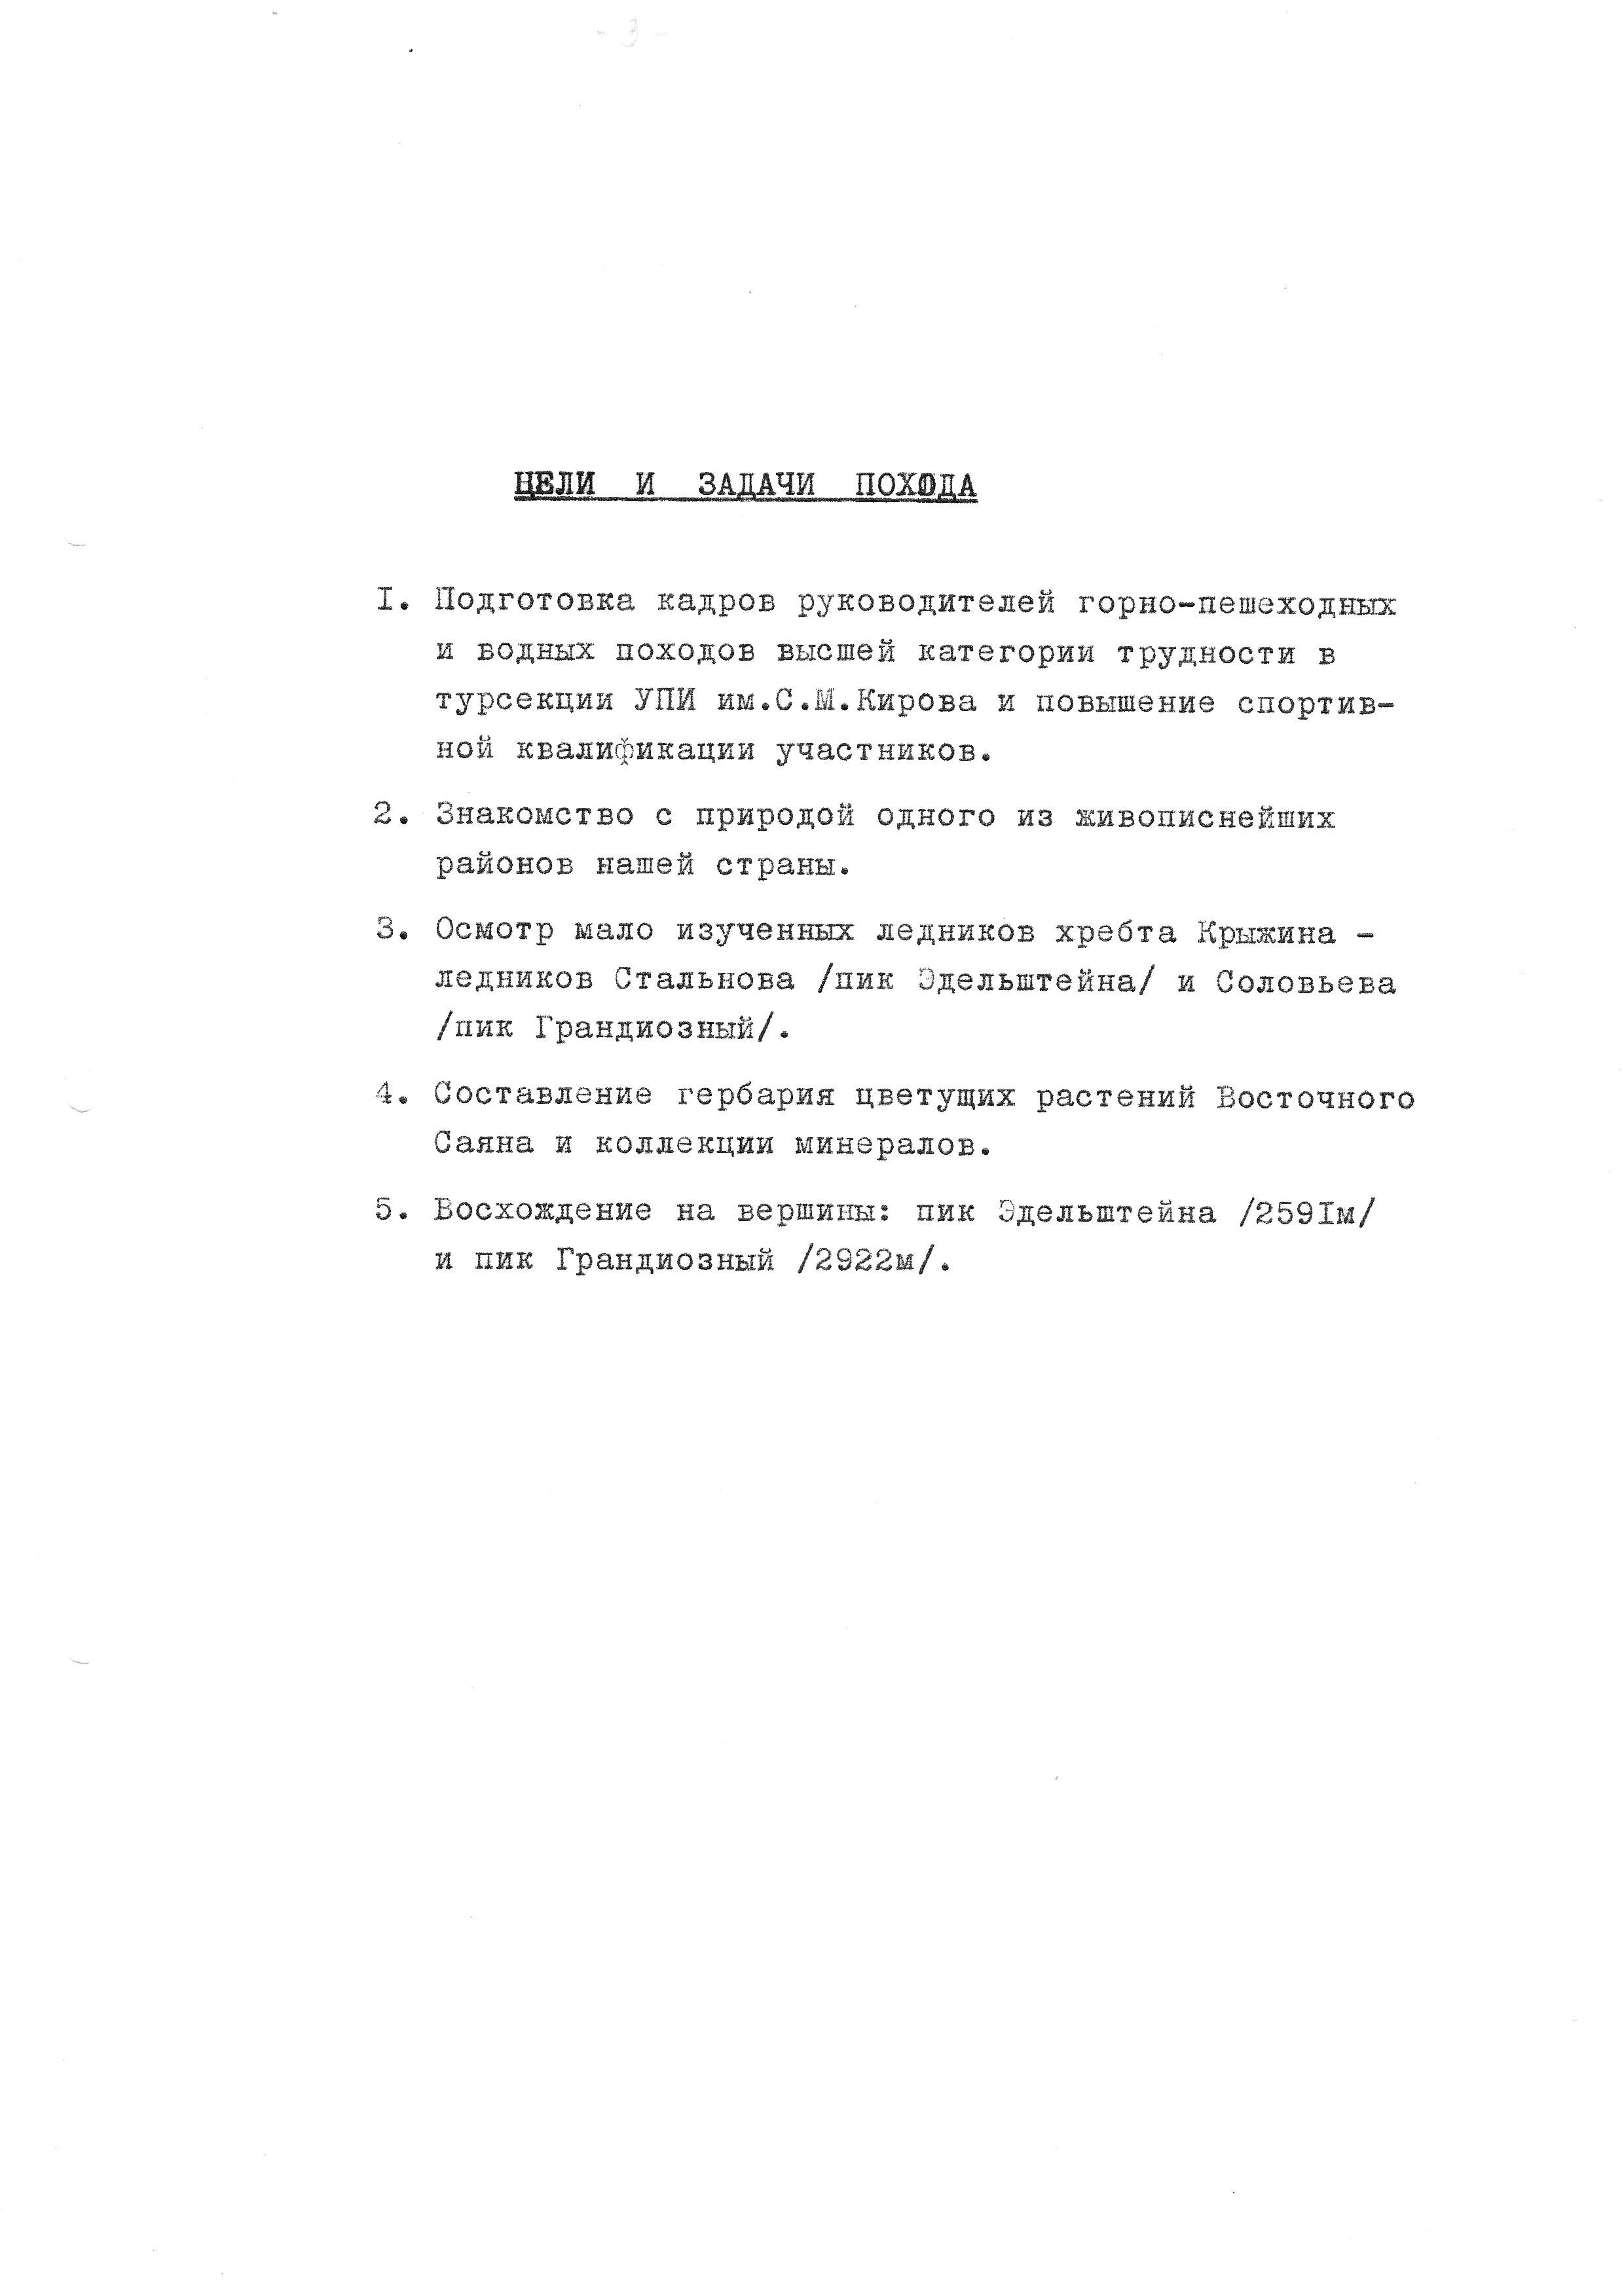 https://img-fotki.yandex.ru/get/2814/164520479.7d/0_e48b1_b7deb25d_orig.jpg